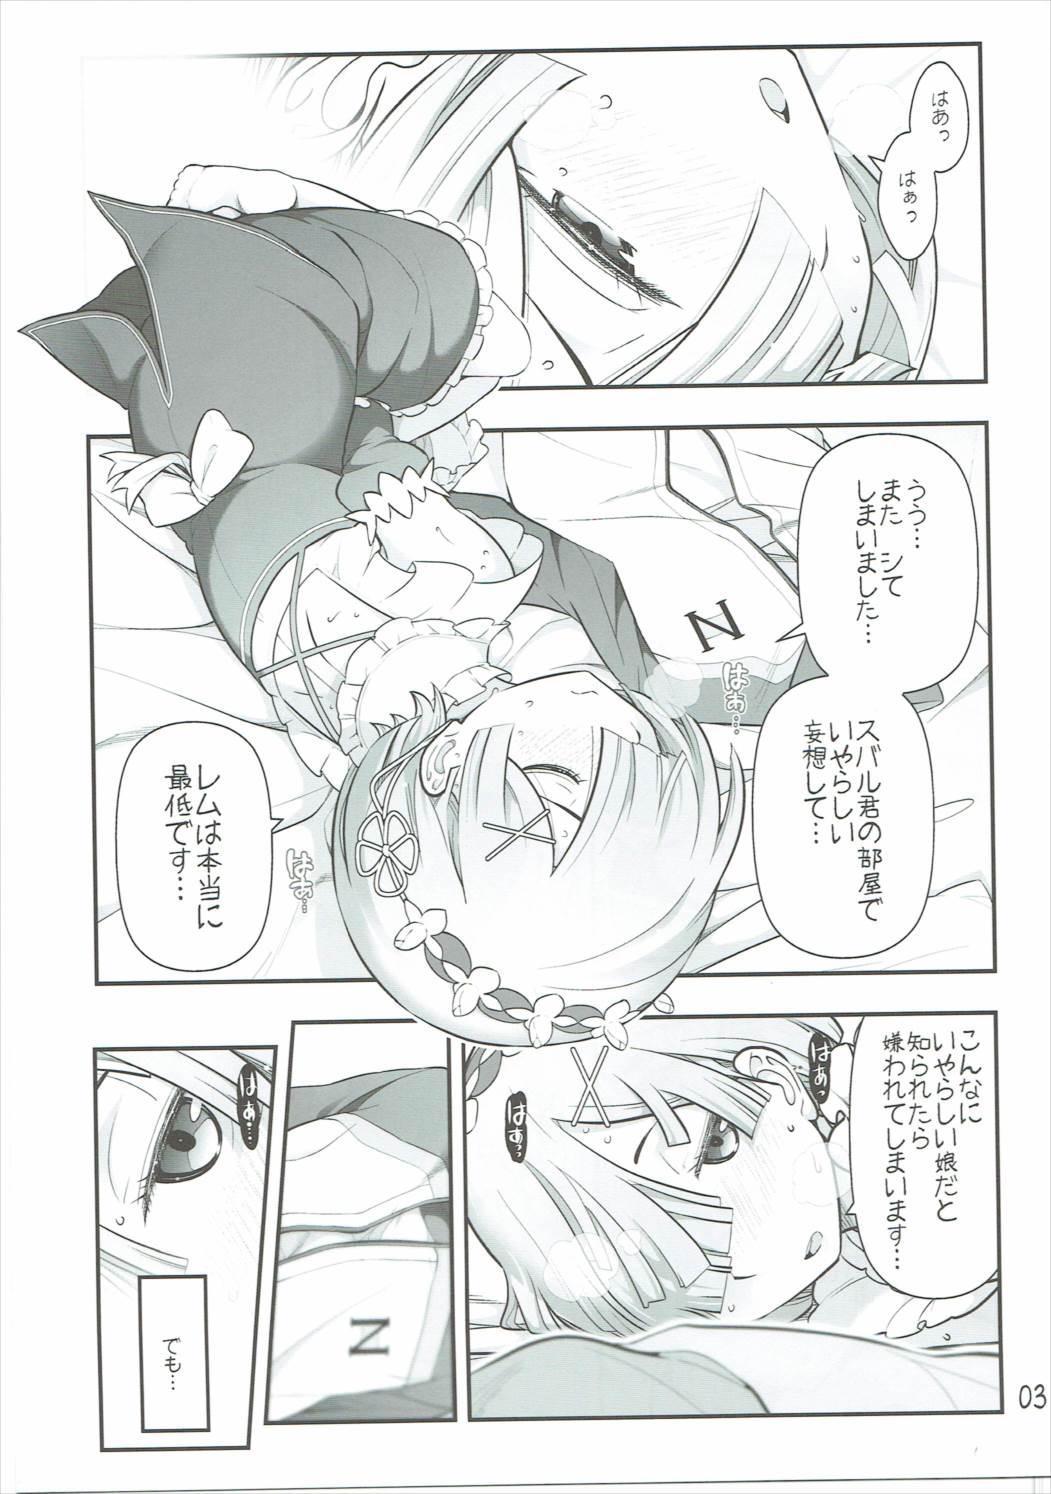 RMH Rem-san maji ecchi 3